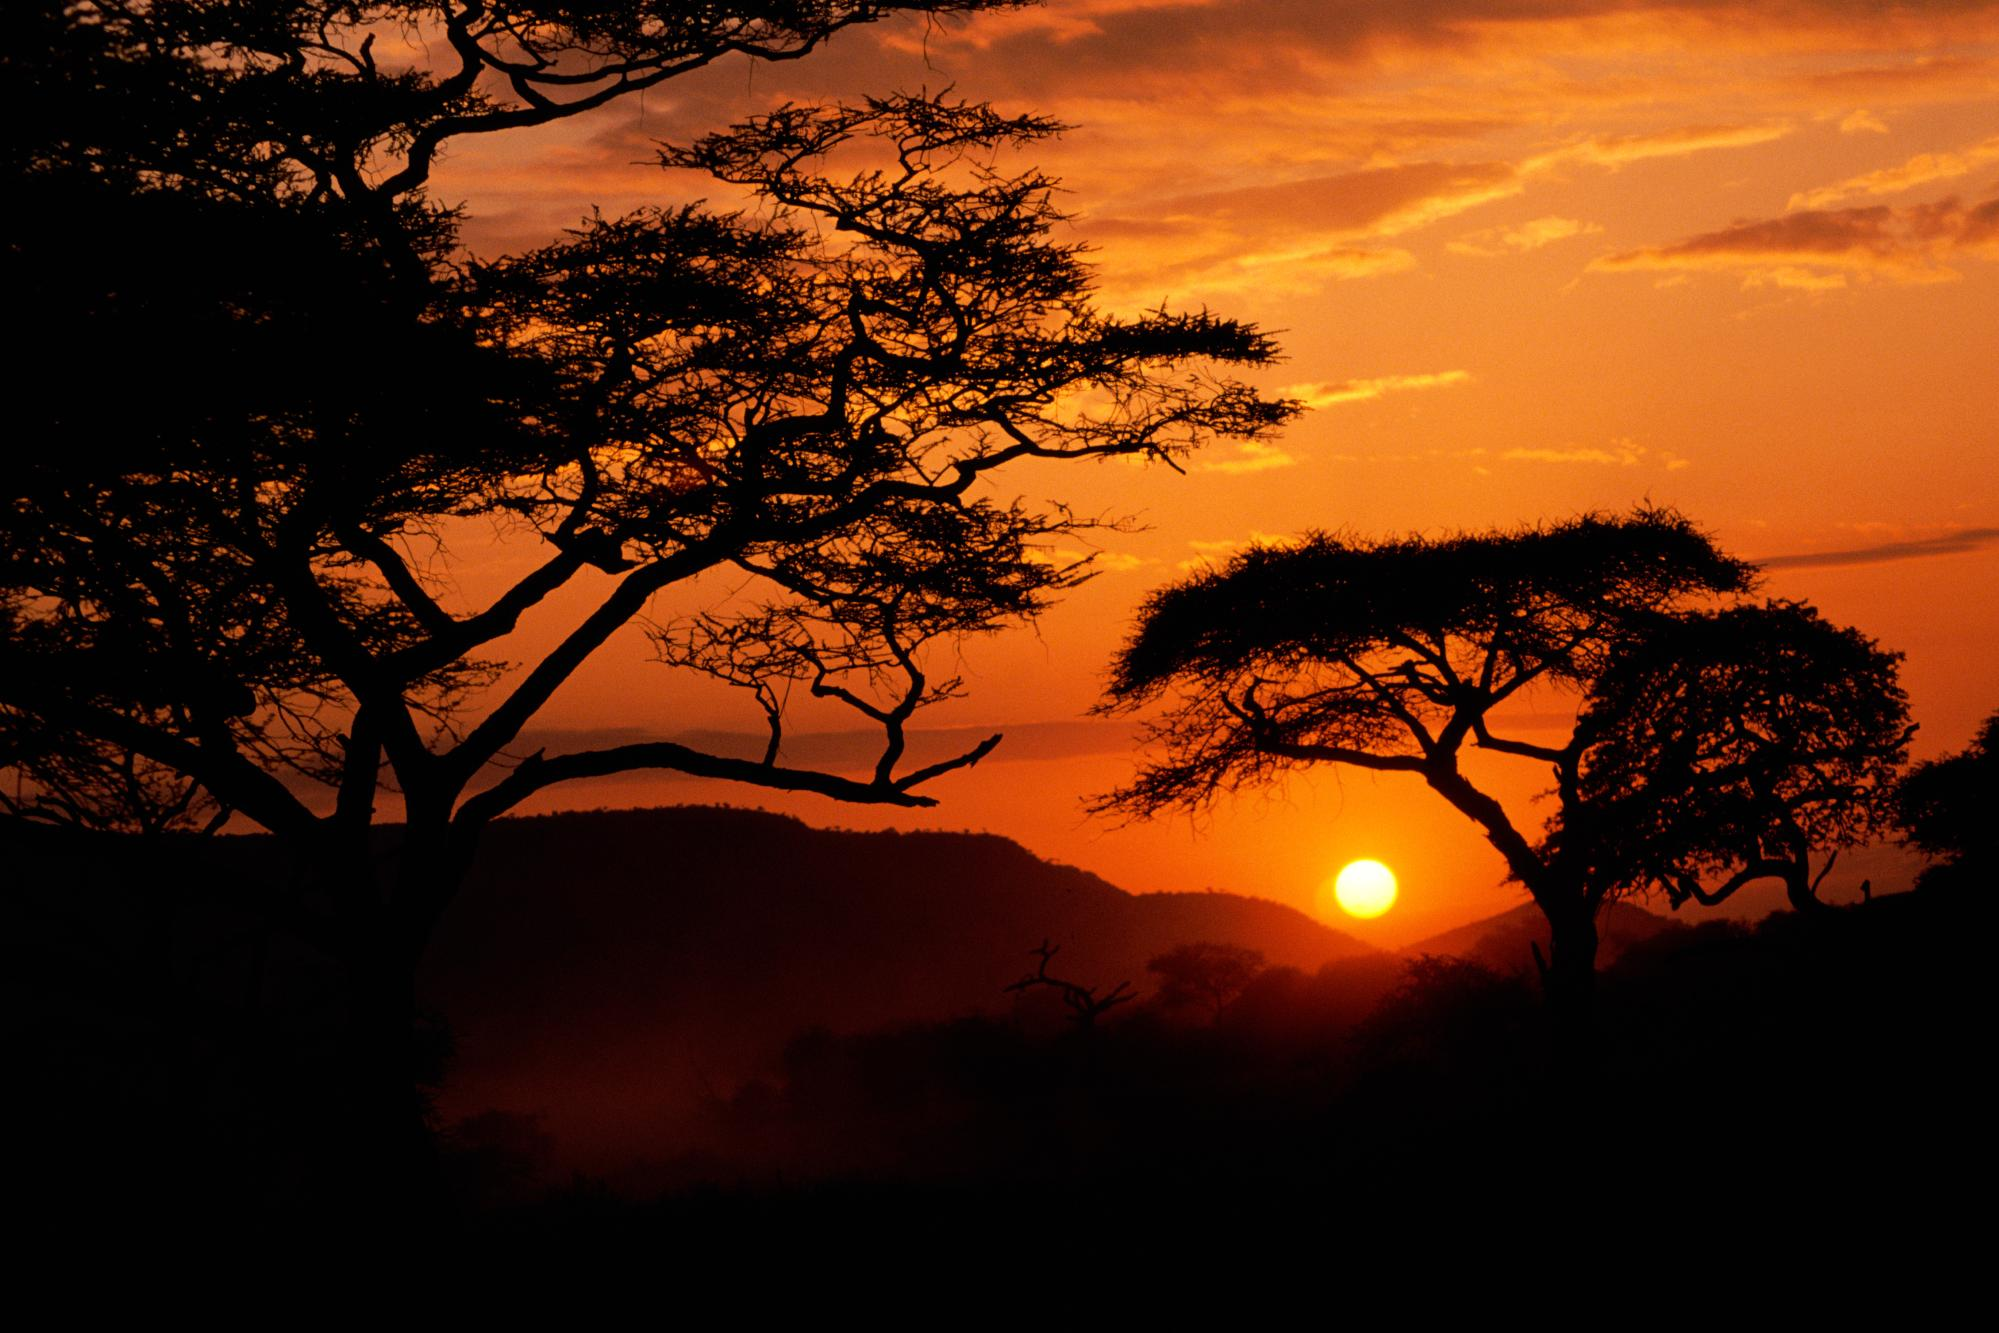 africa wallpaper,sky,nature,sunset,tree,sunrise